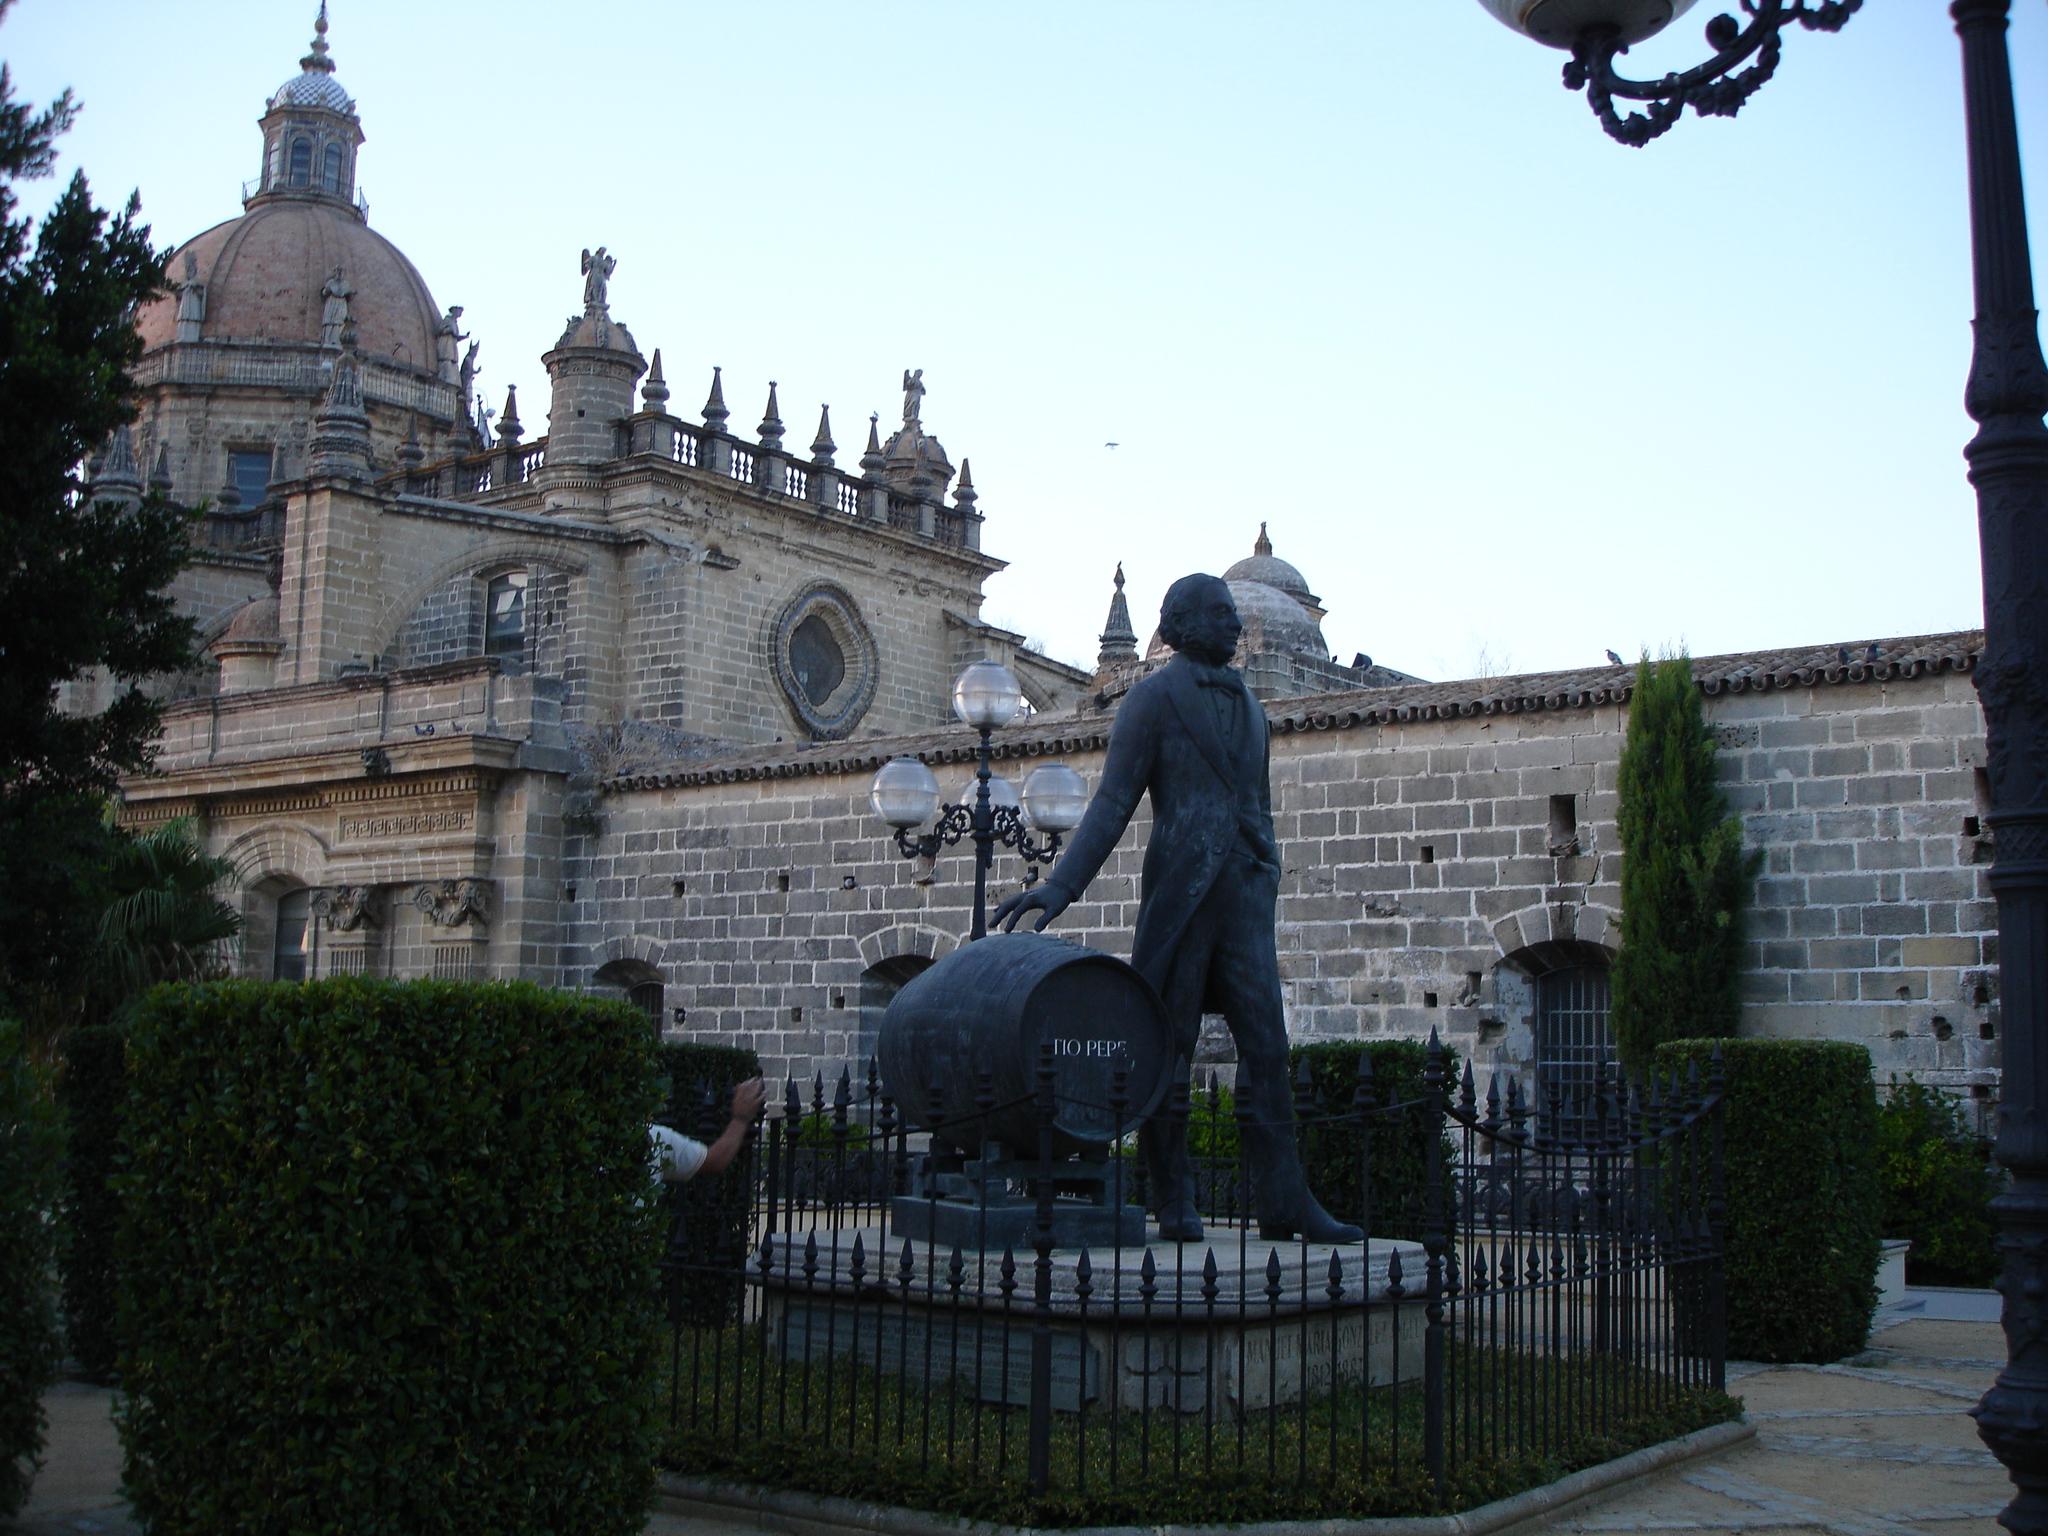 http://upload.wikimedia.org/wikipedia/commons/0/0c/Catedral-Jerez-Dsc02975.jpg